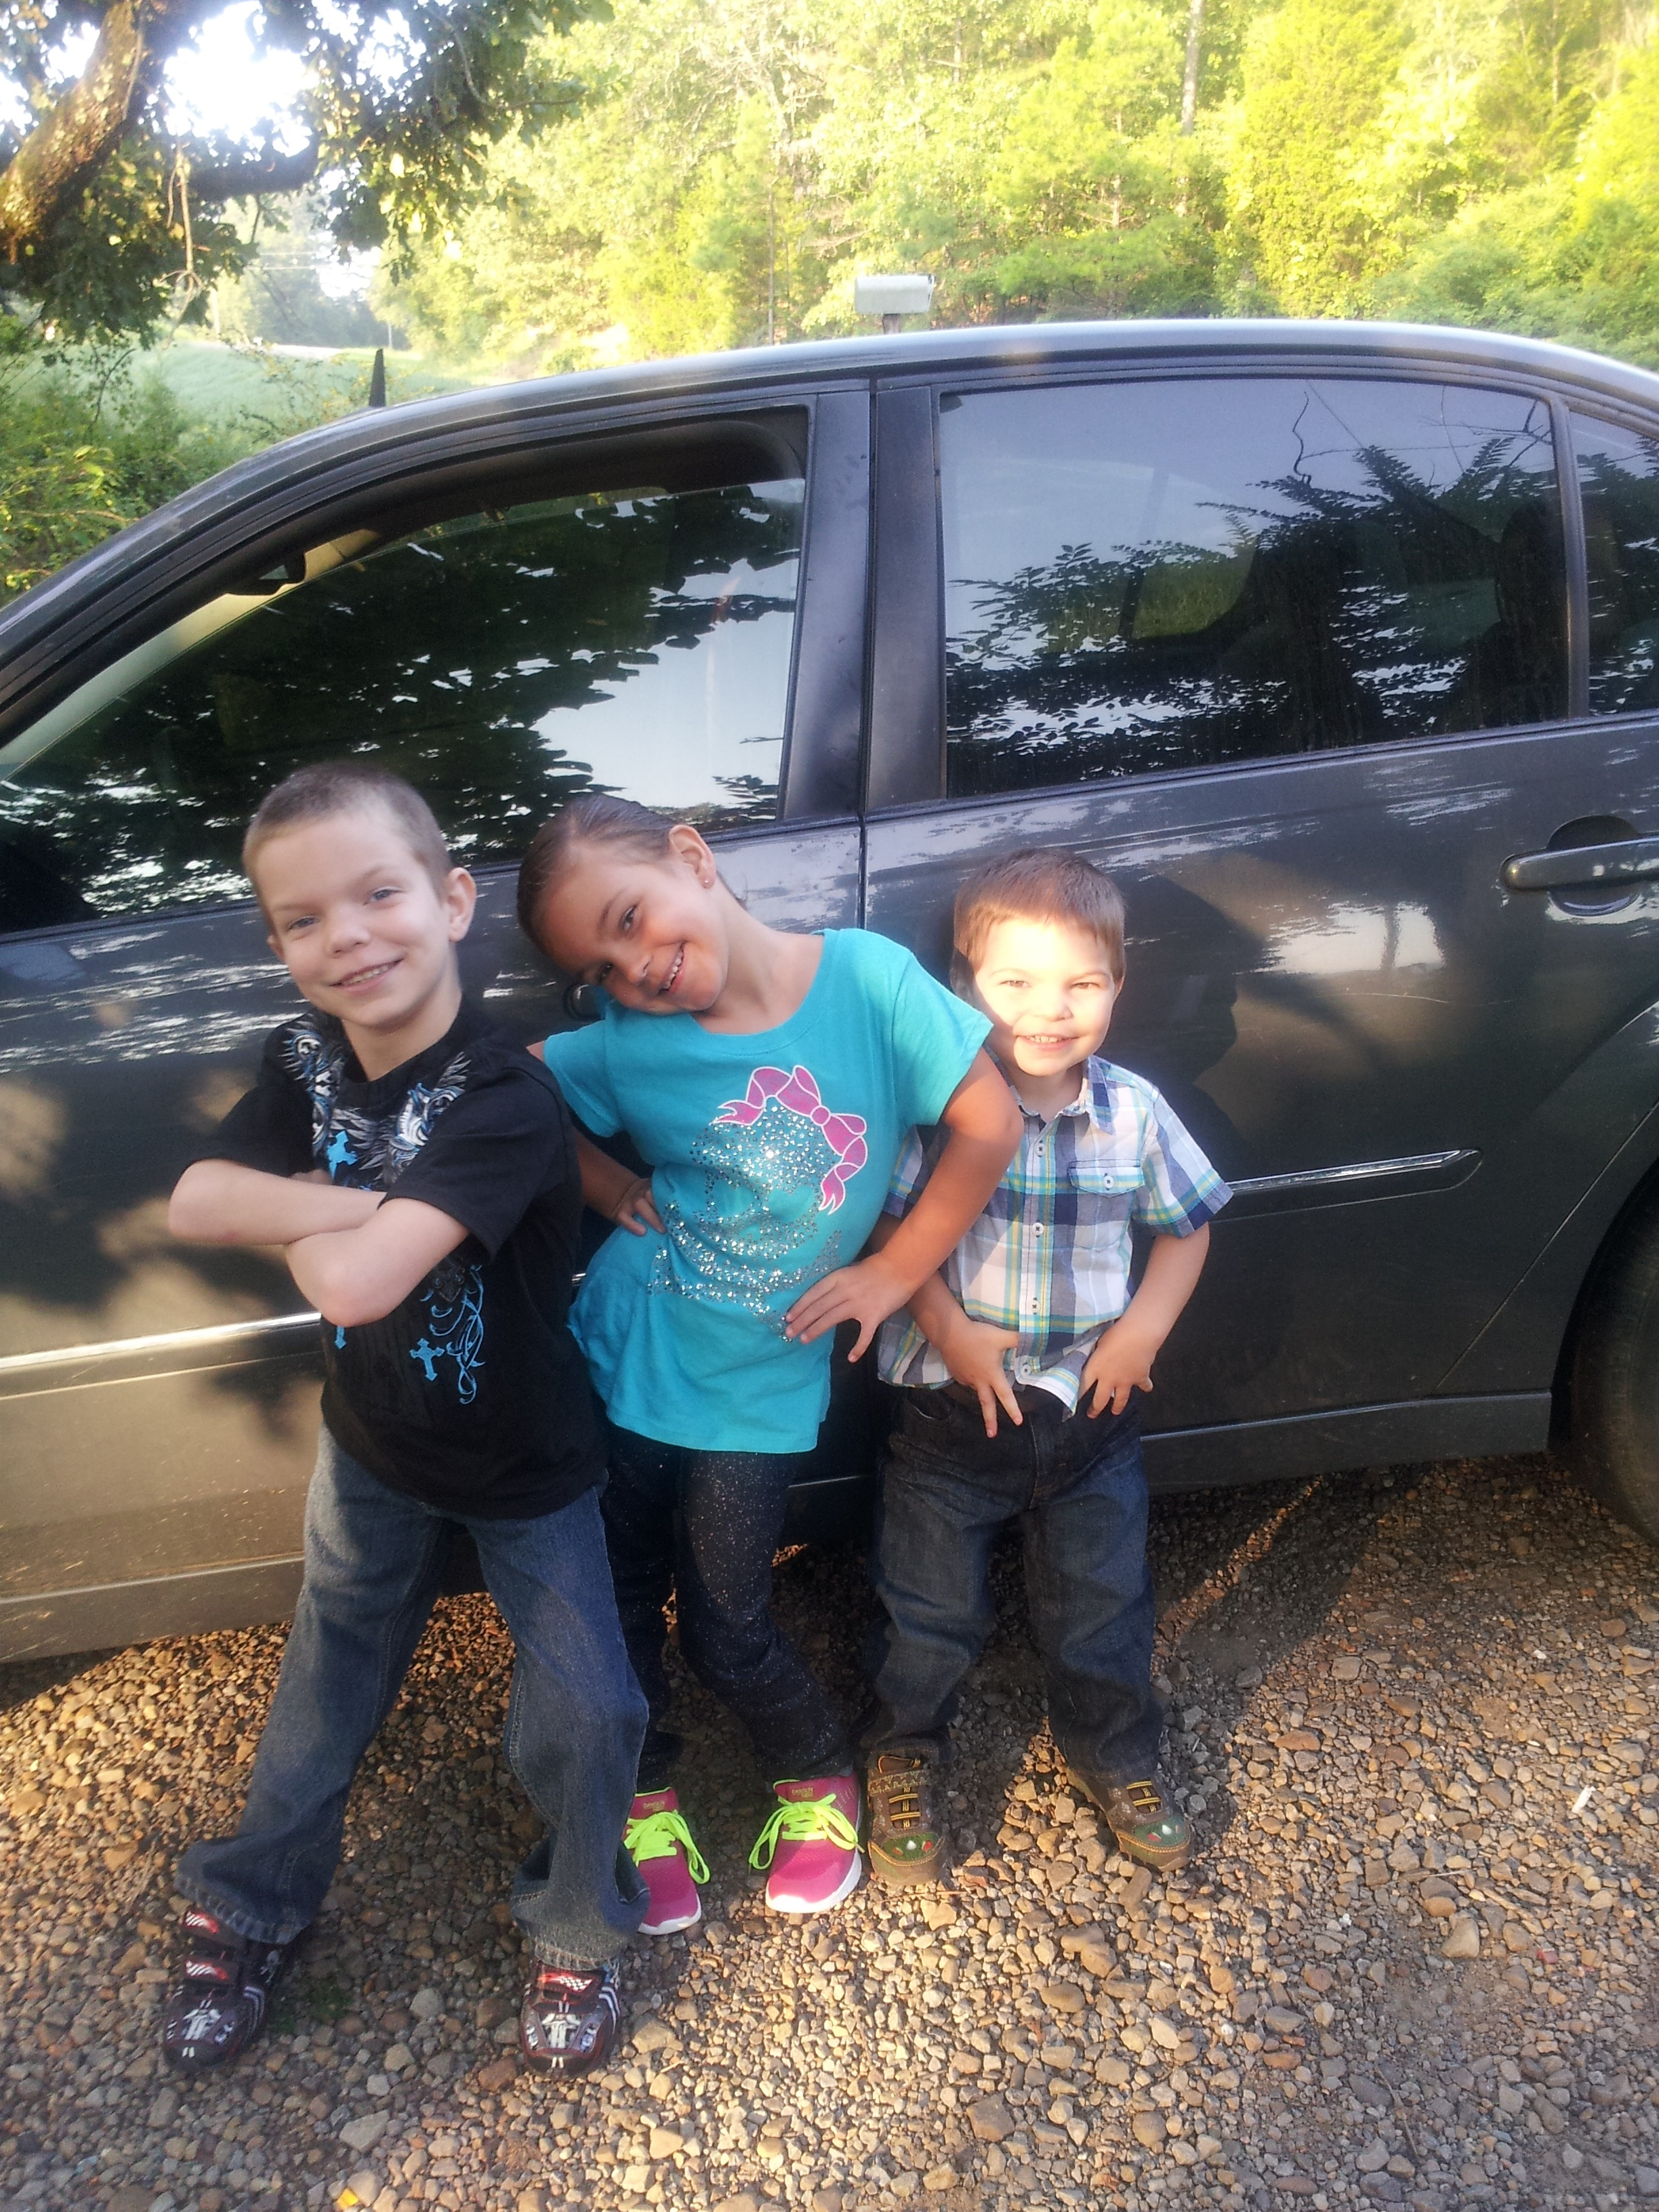 Brayden, Aubry, and Skyler